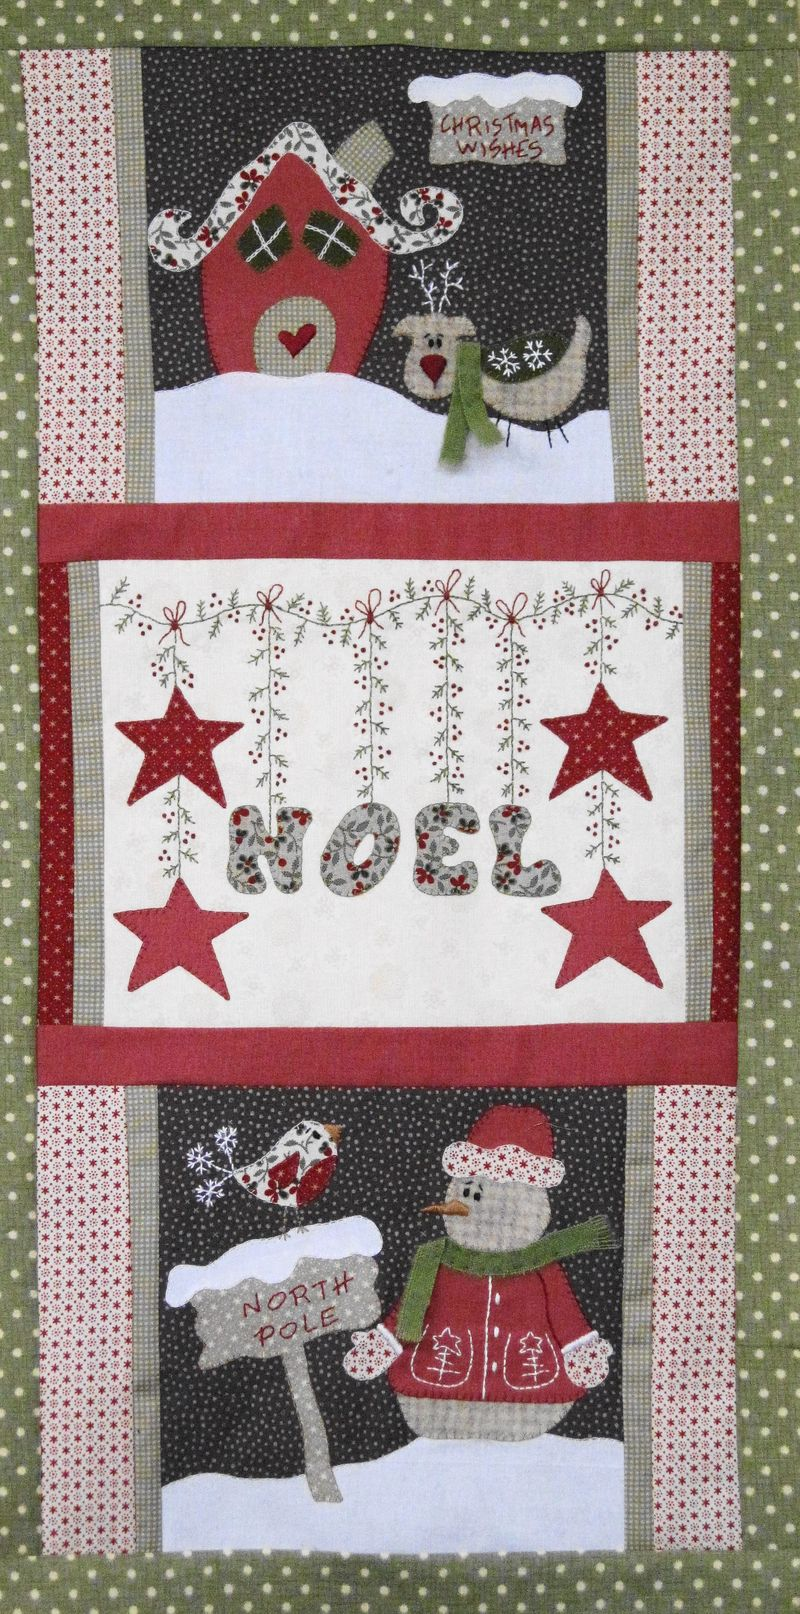 Noel wishes